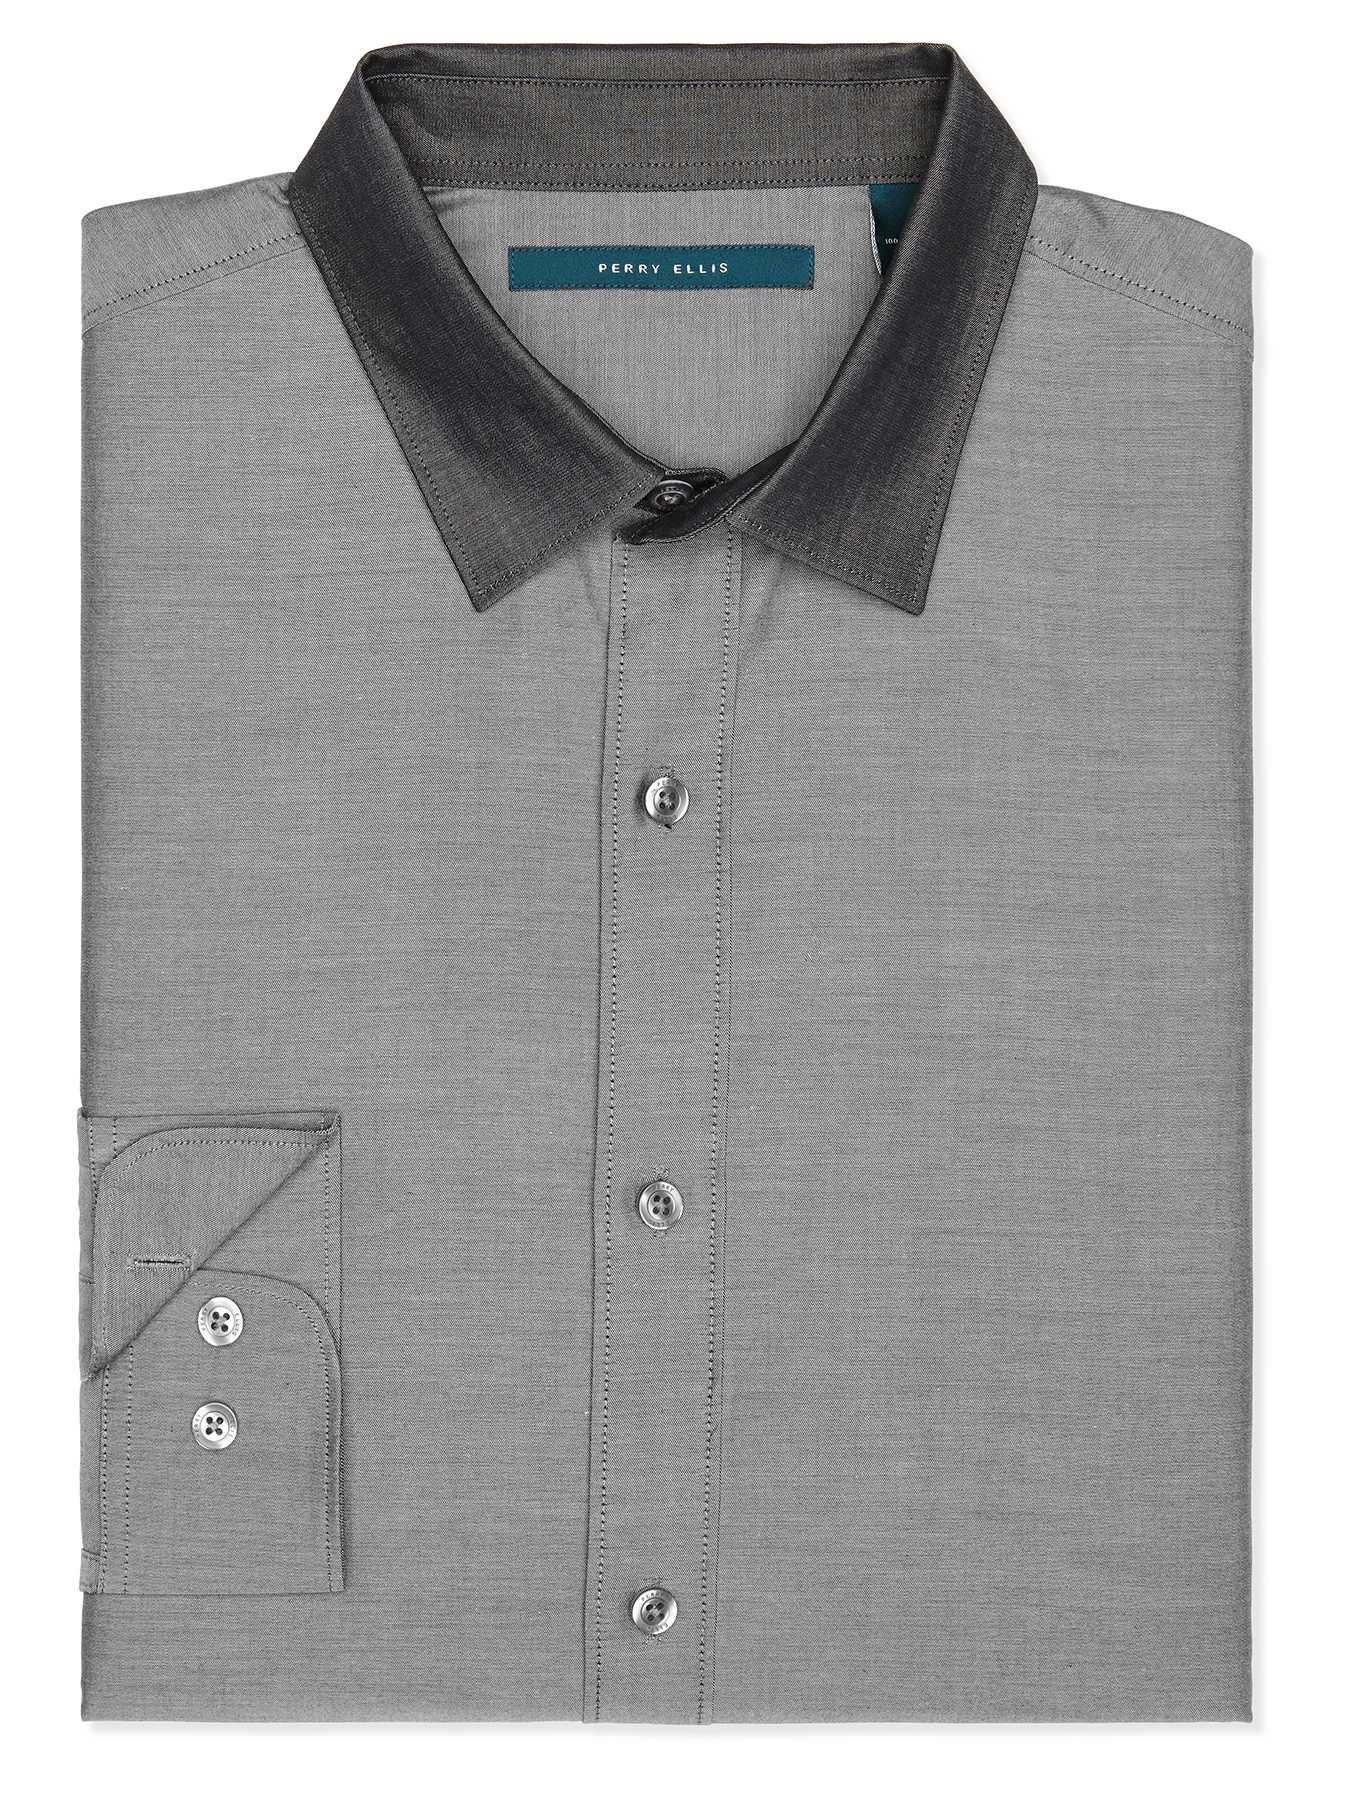 Perry Ellis Iridescent Twill Fabric Shirt